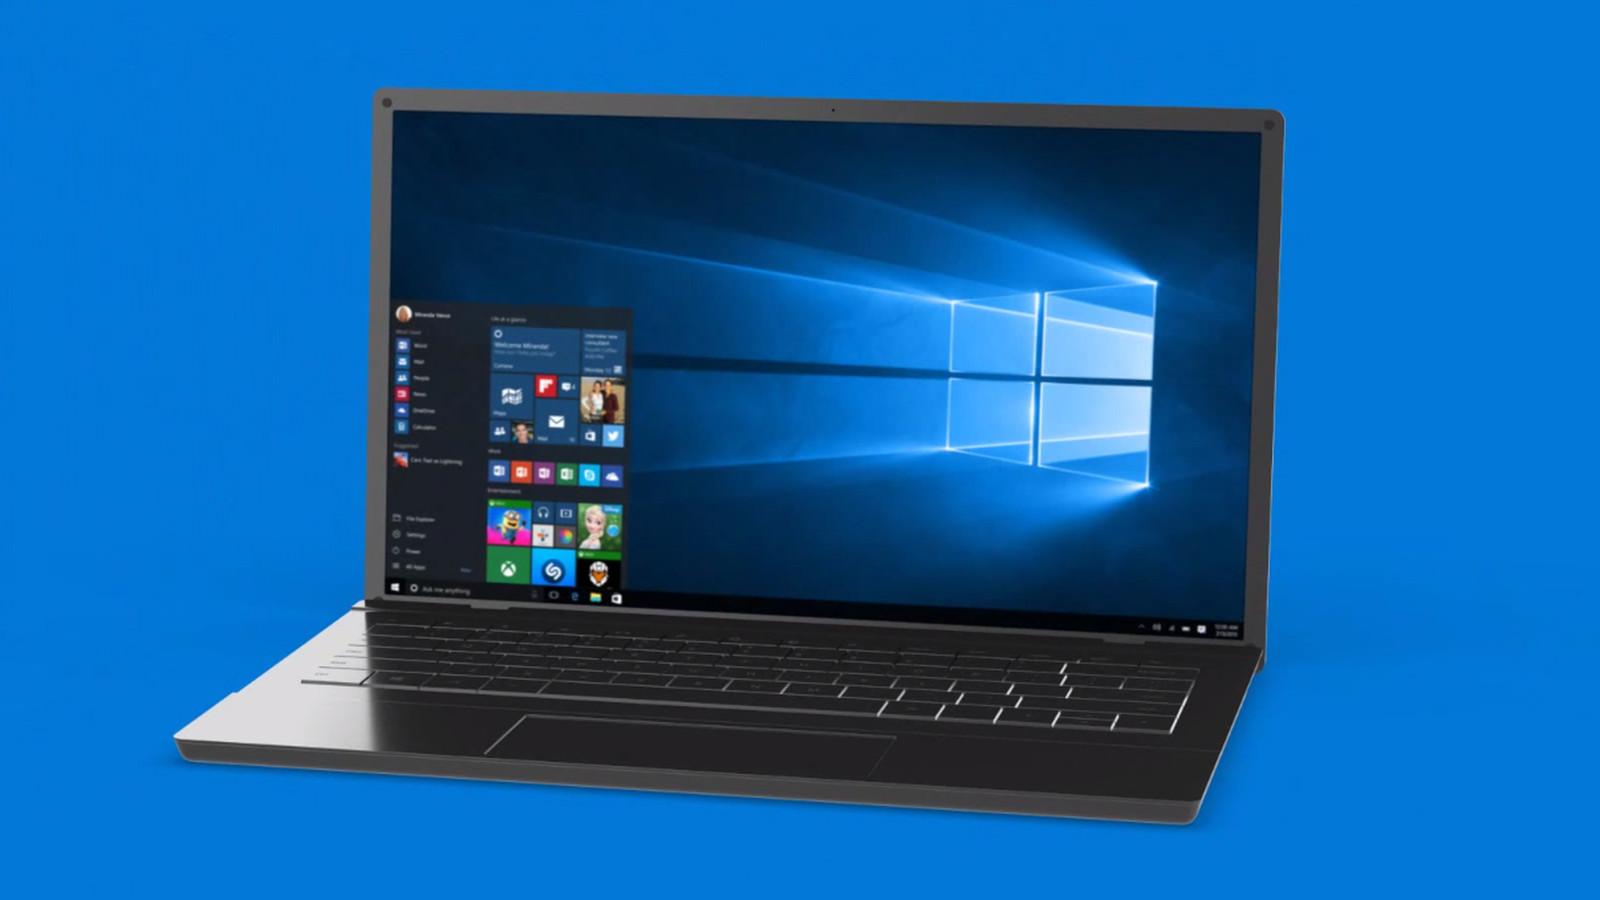 Windows 10's New Desktop Wallpaper Is Made Out Of Light